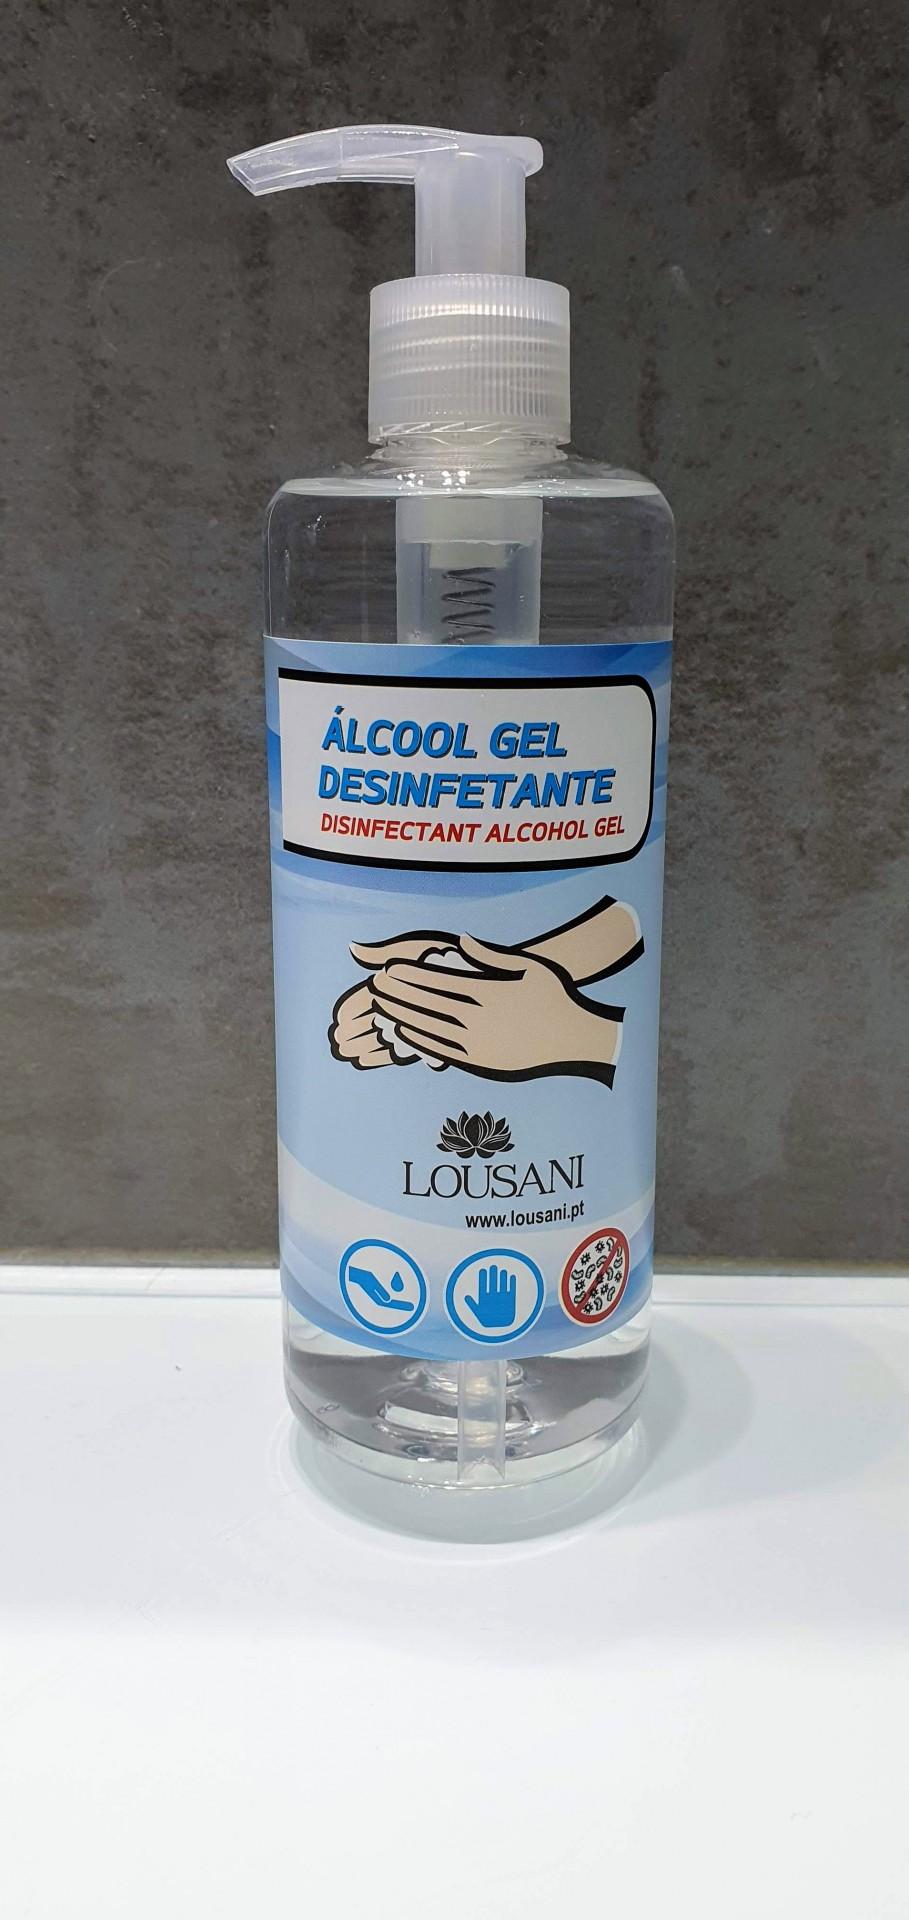 Doseador Desinfetante alcool Gel 300 ml